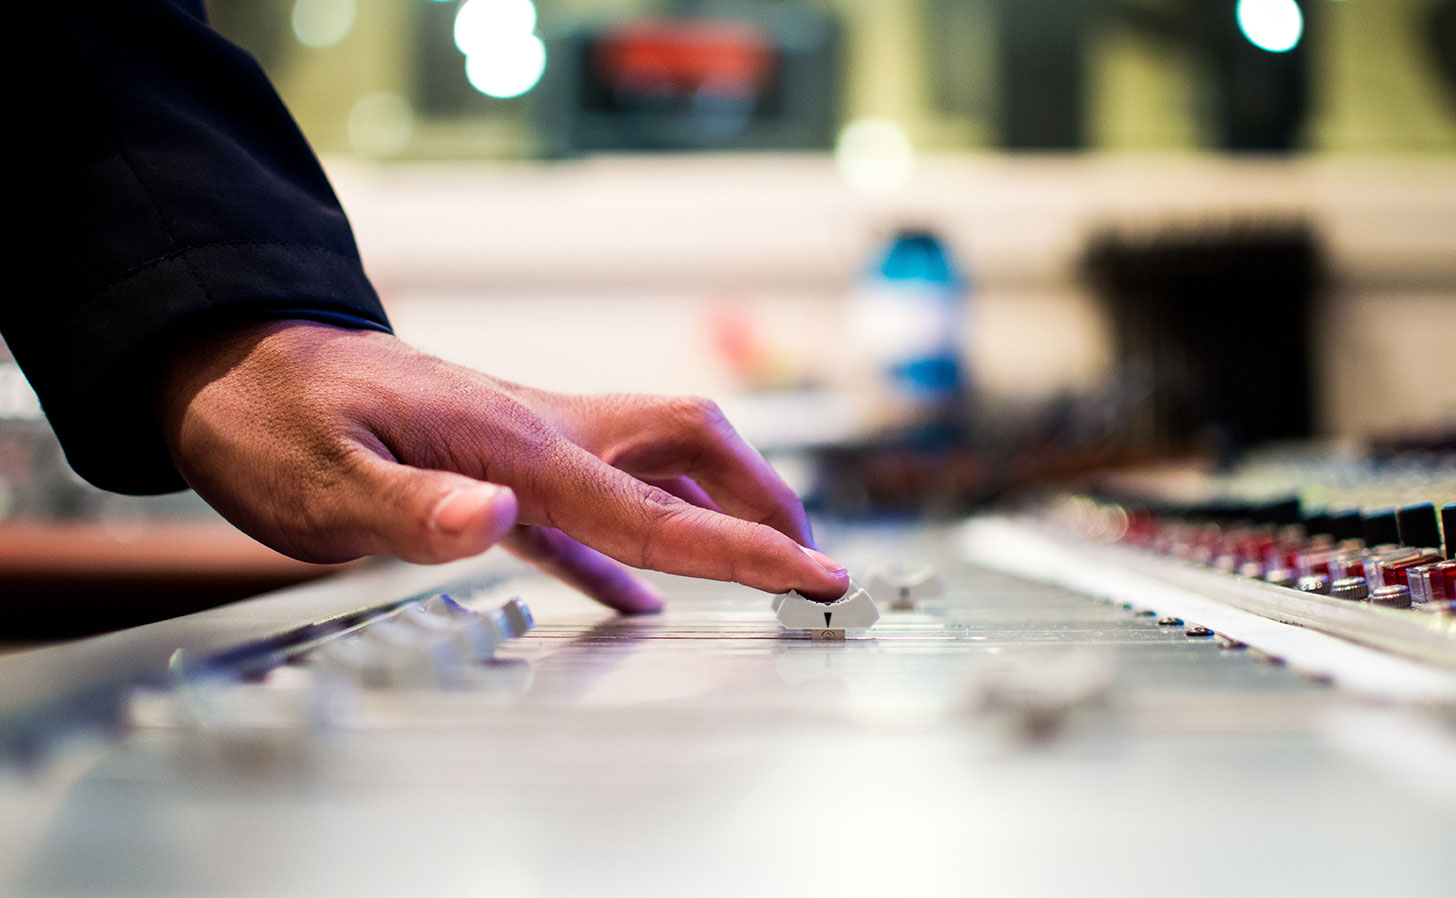 Radiostudio. Foto: Drew Patrick Miller / Unsplash